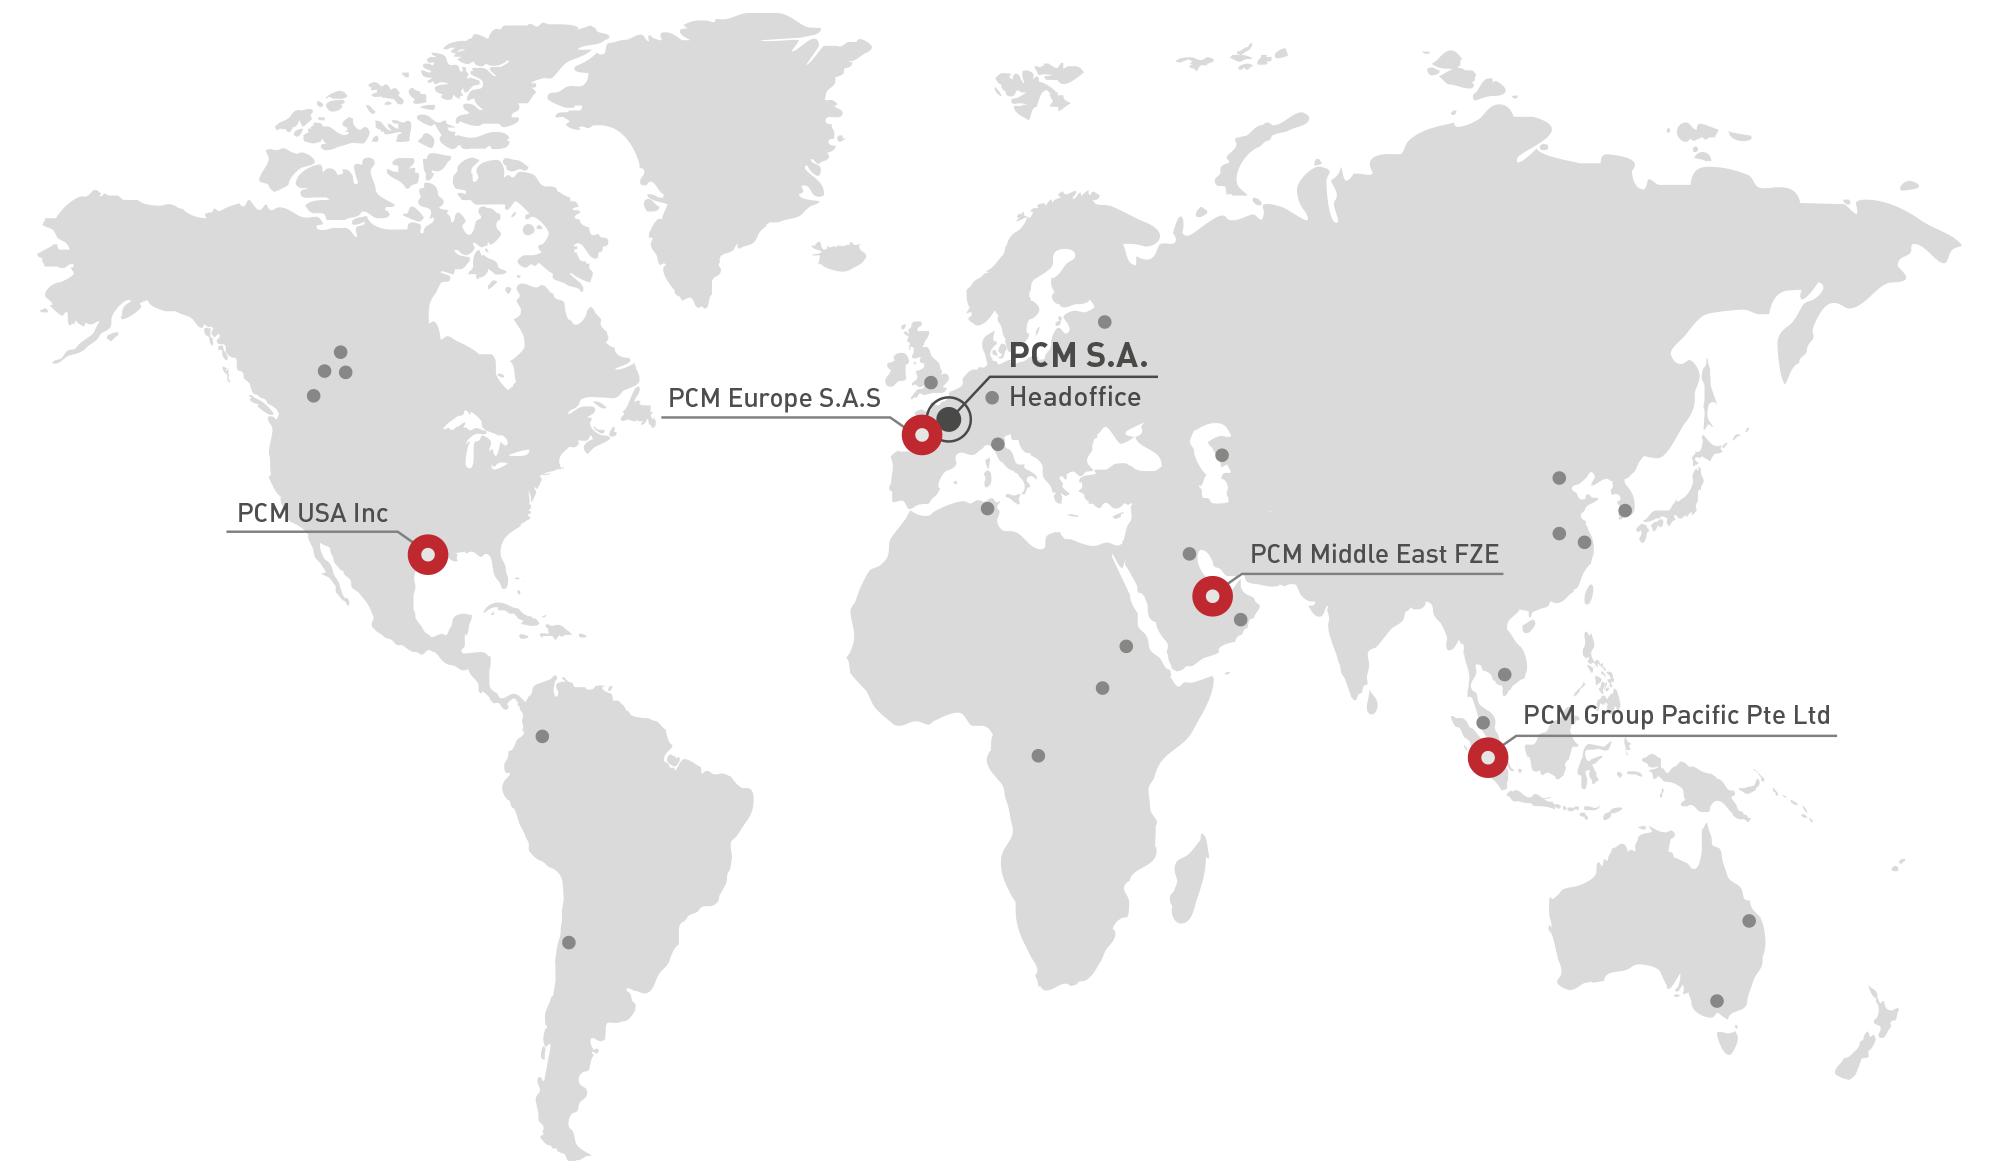 PCM Kontakte weltweit